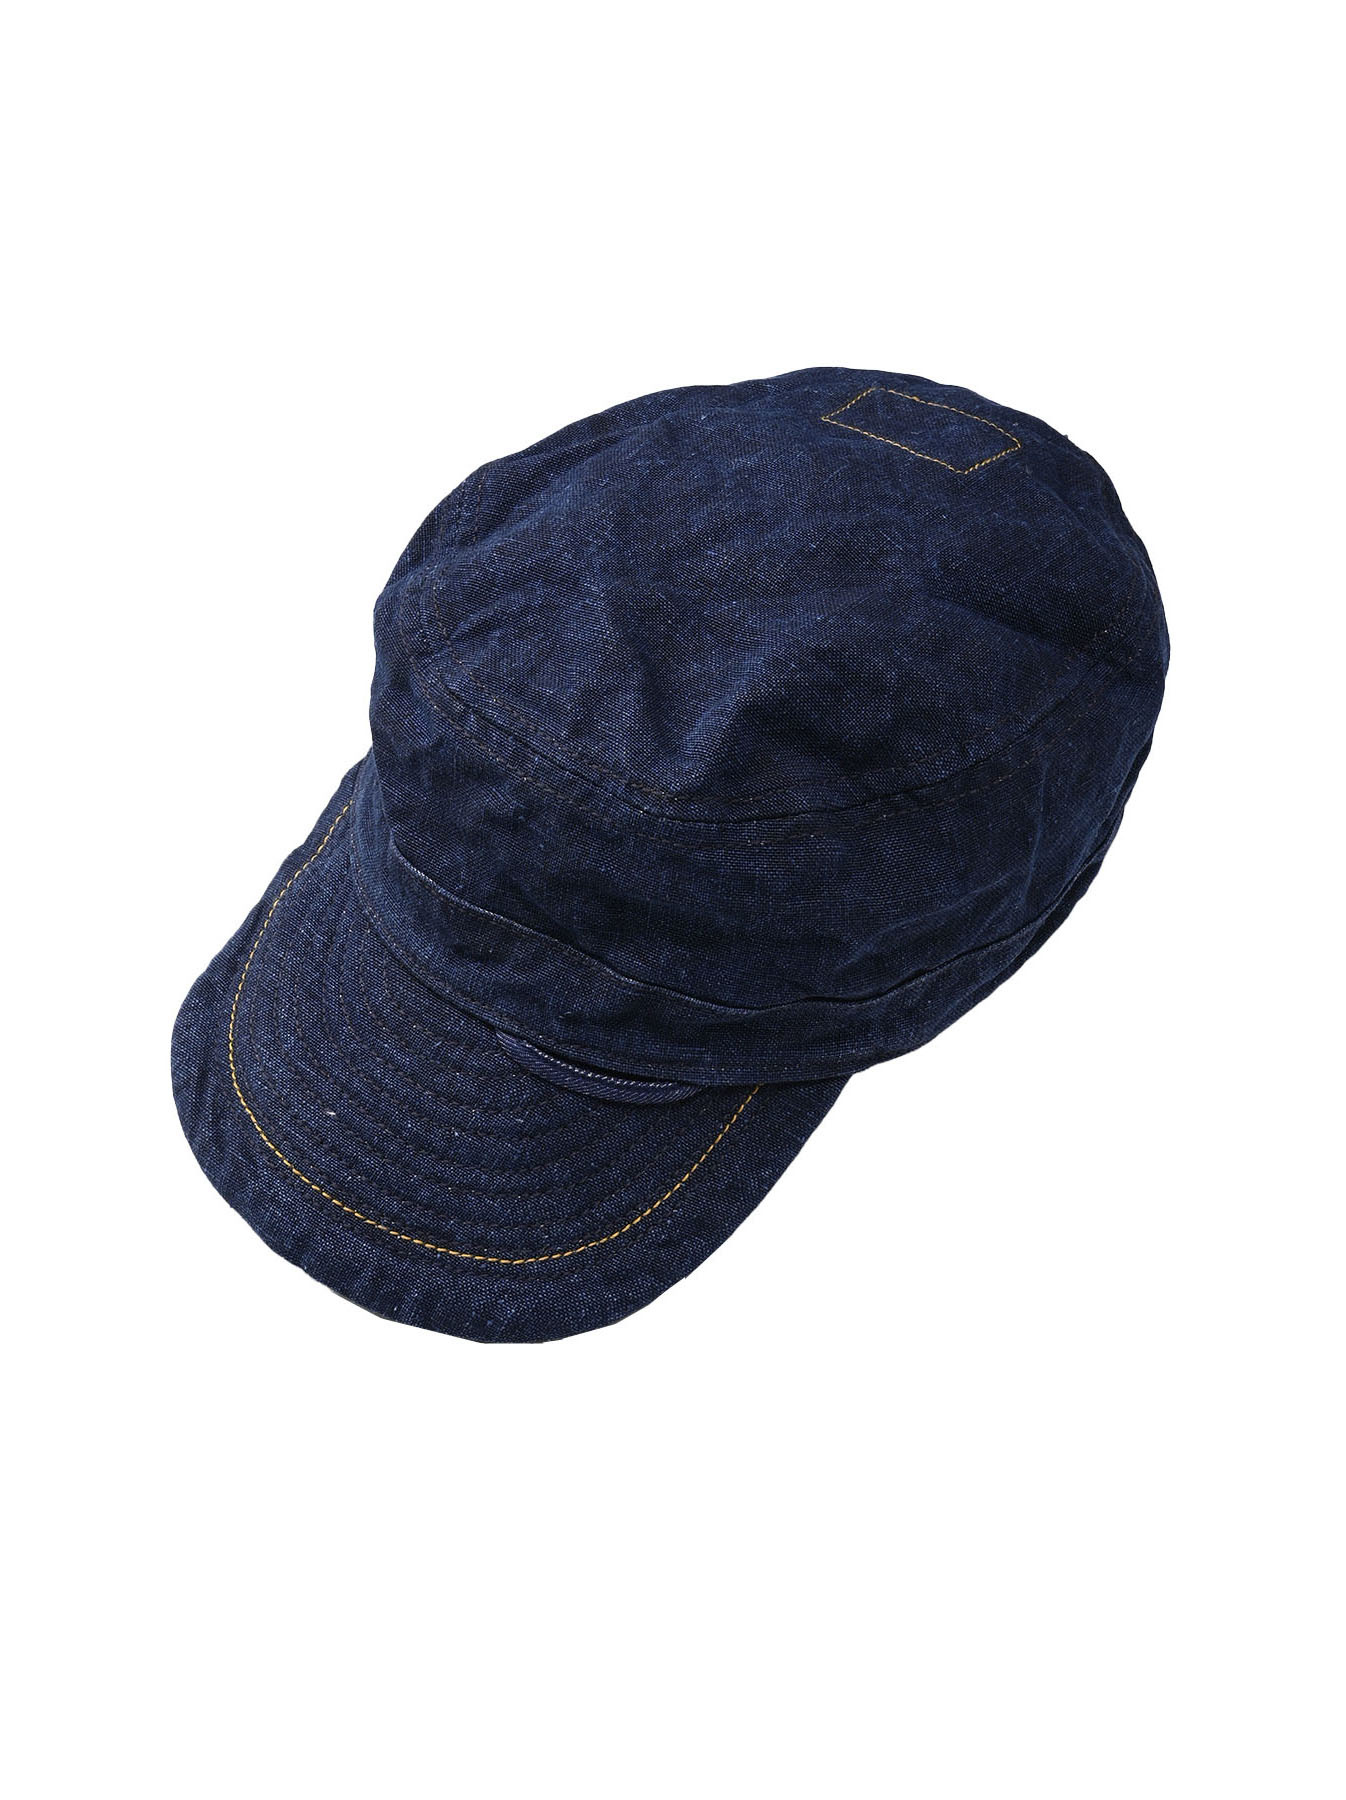 Indigo Linen Duck Work Cap (0421)-1